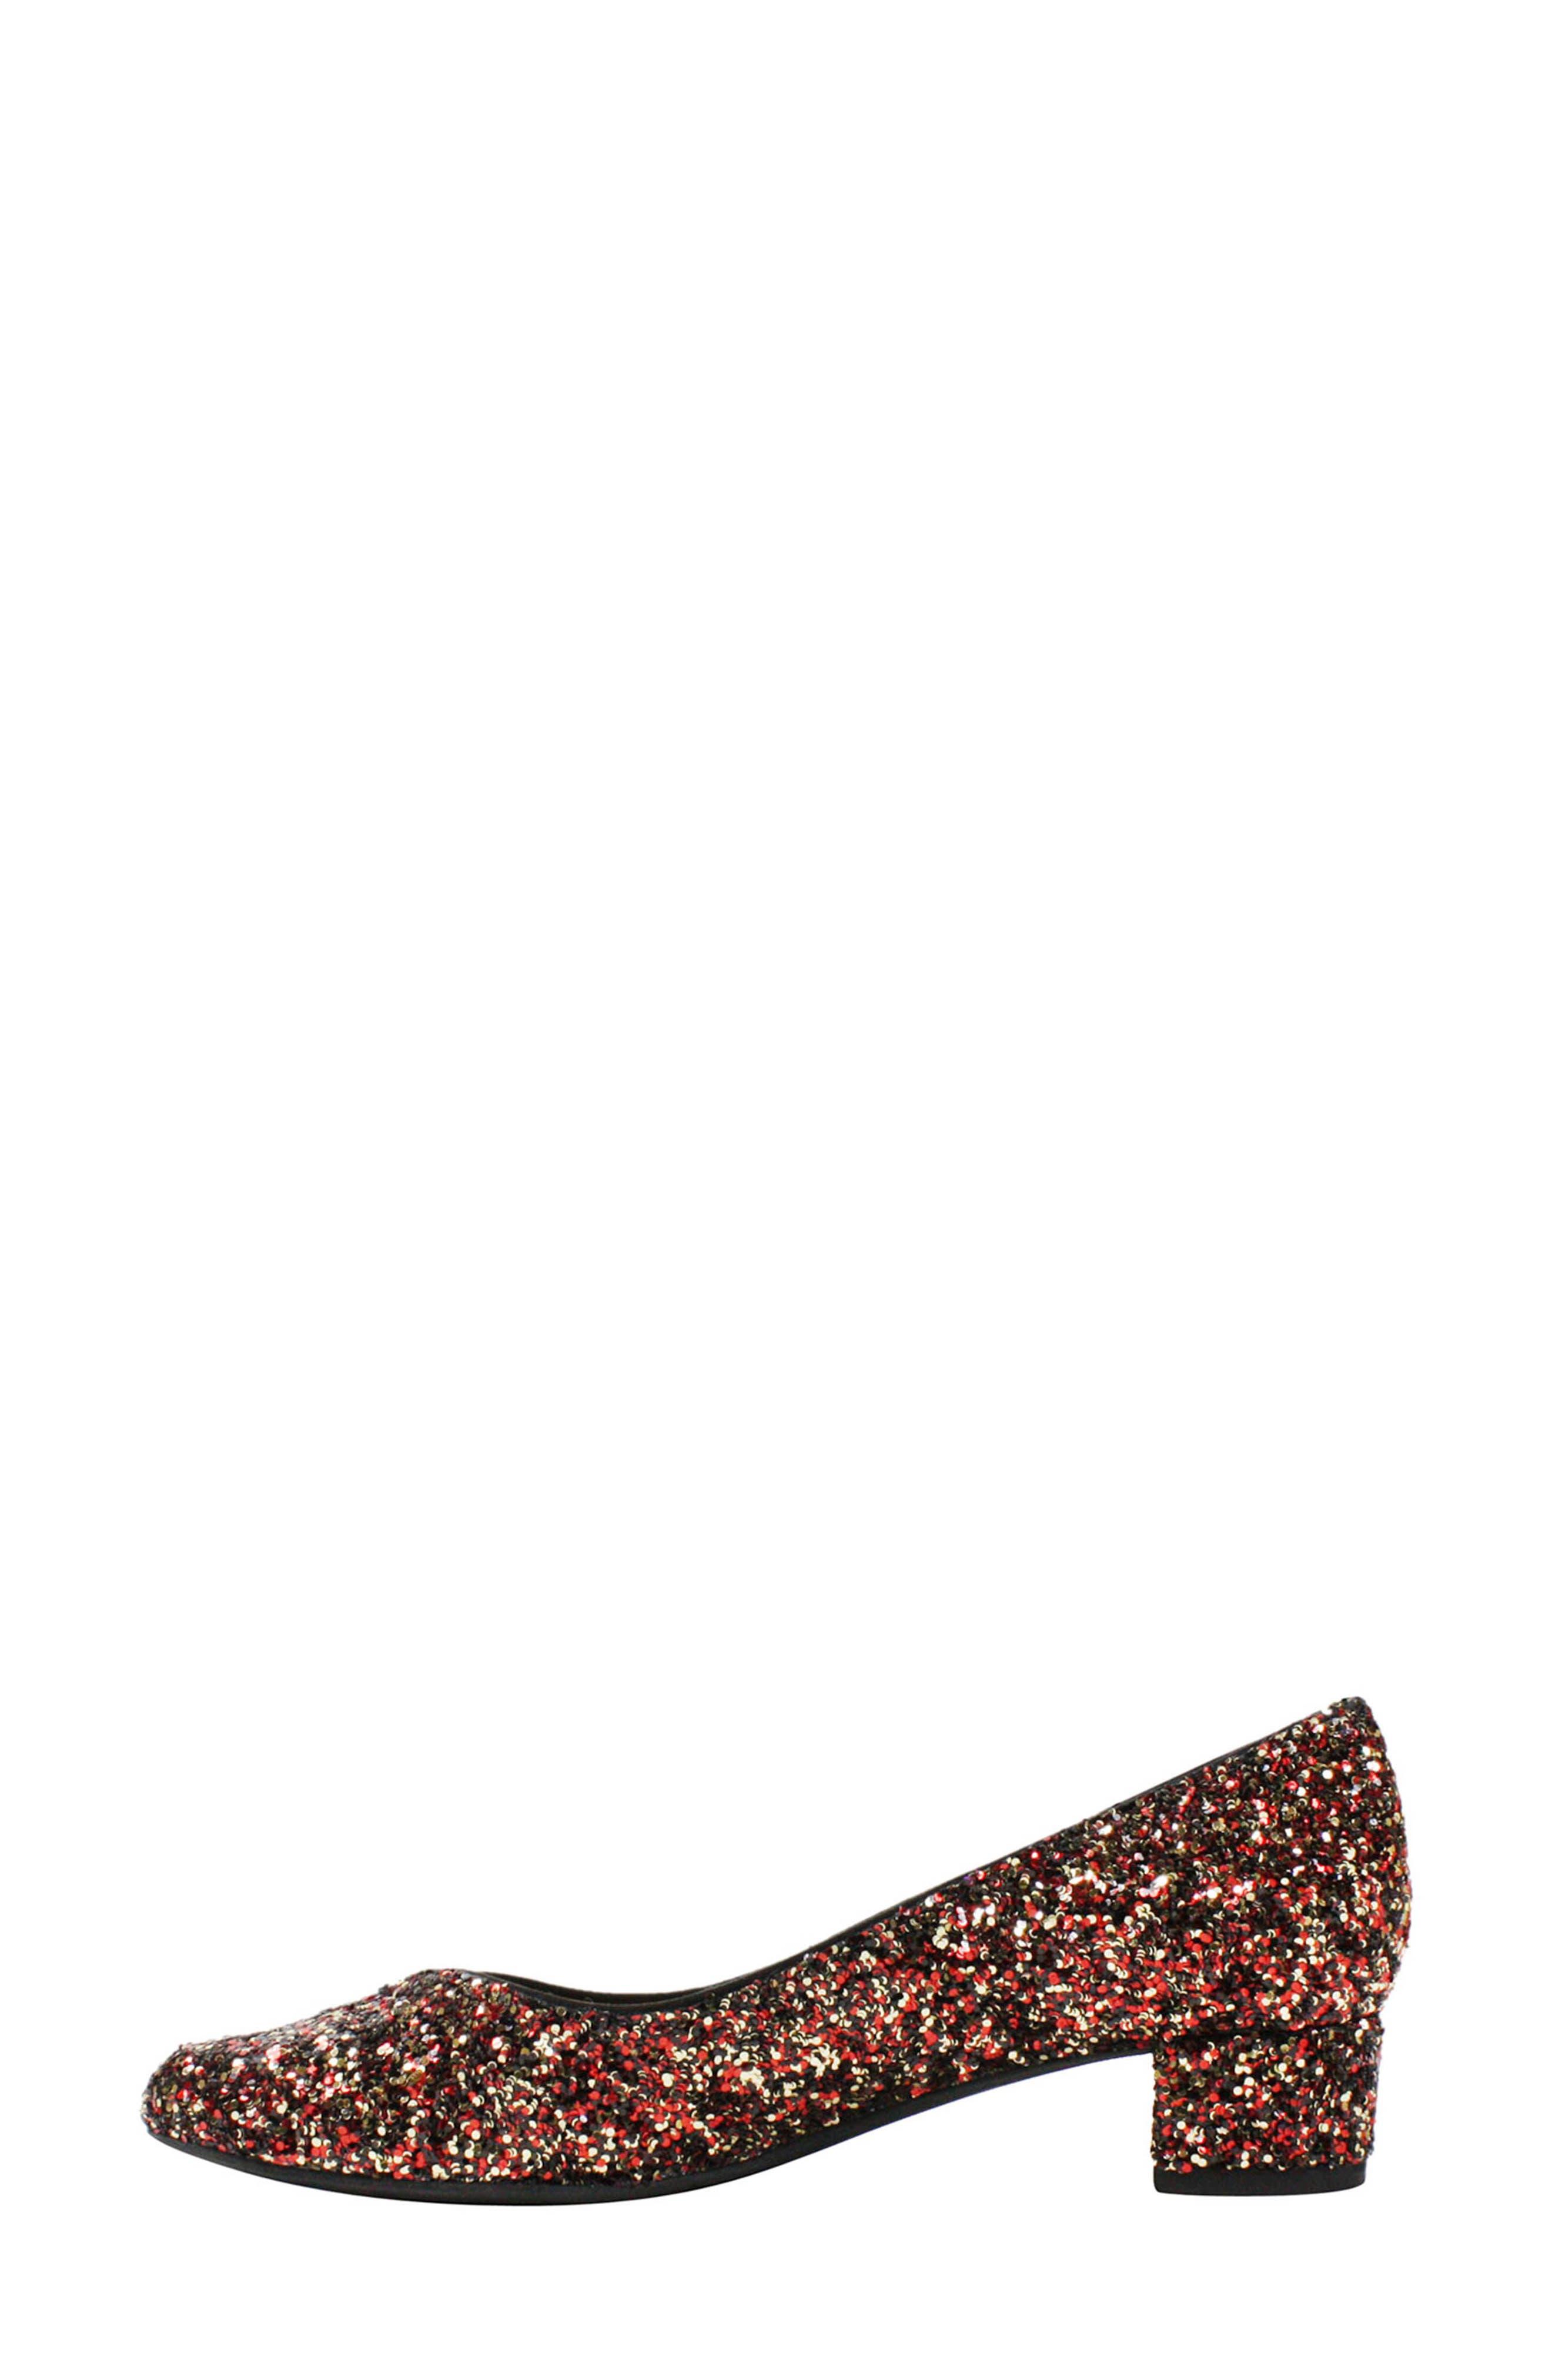 'Bambalina' Block Heel Glitter Pump,                             Alternate thumbnail 8, color,